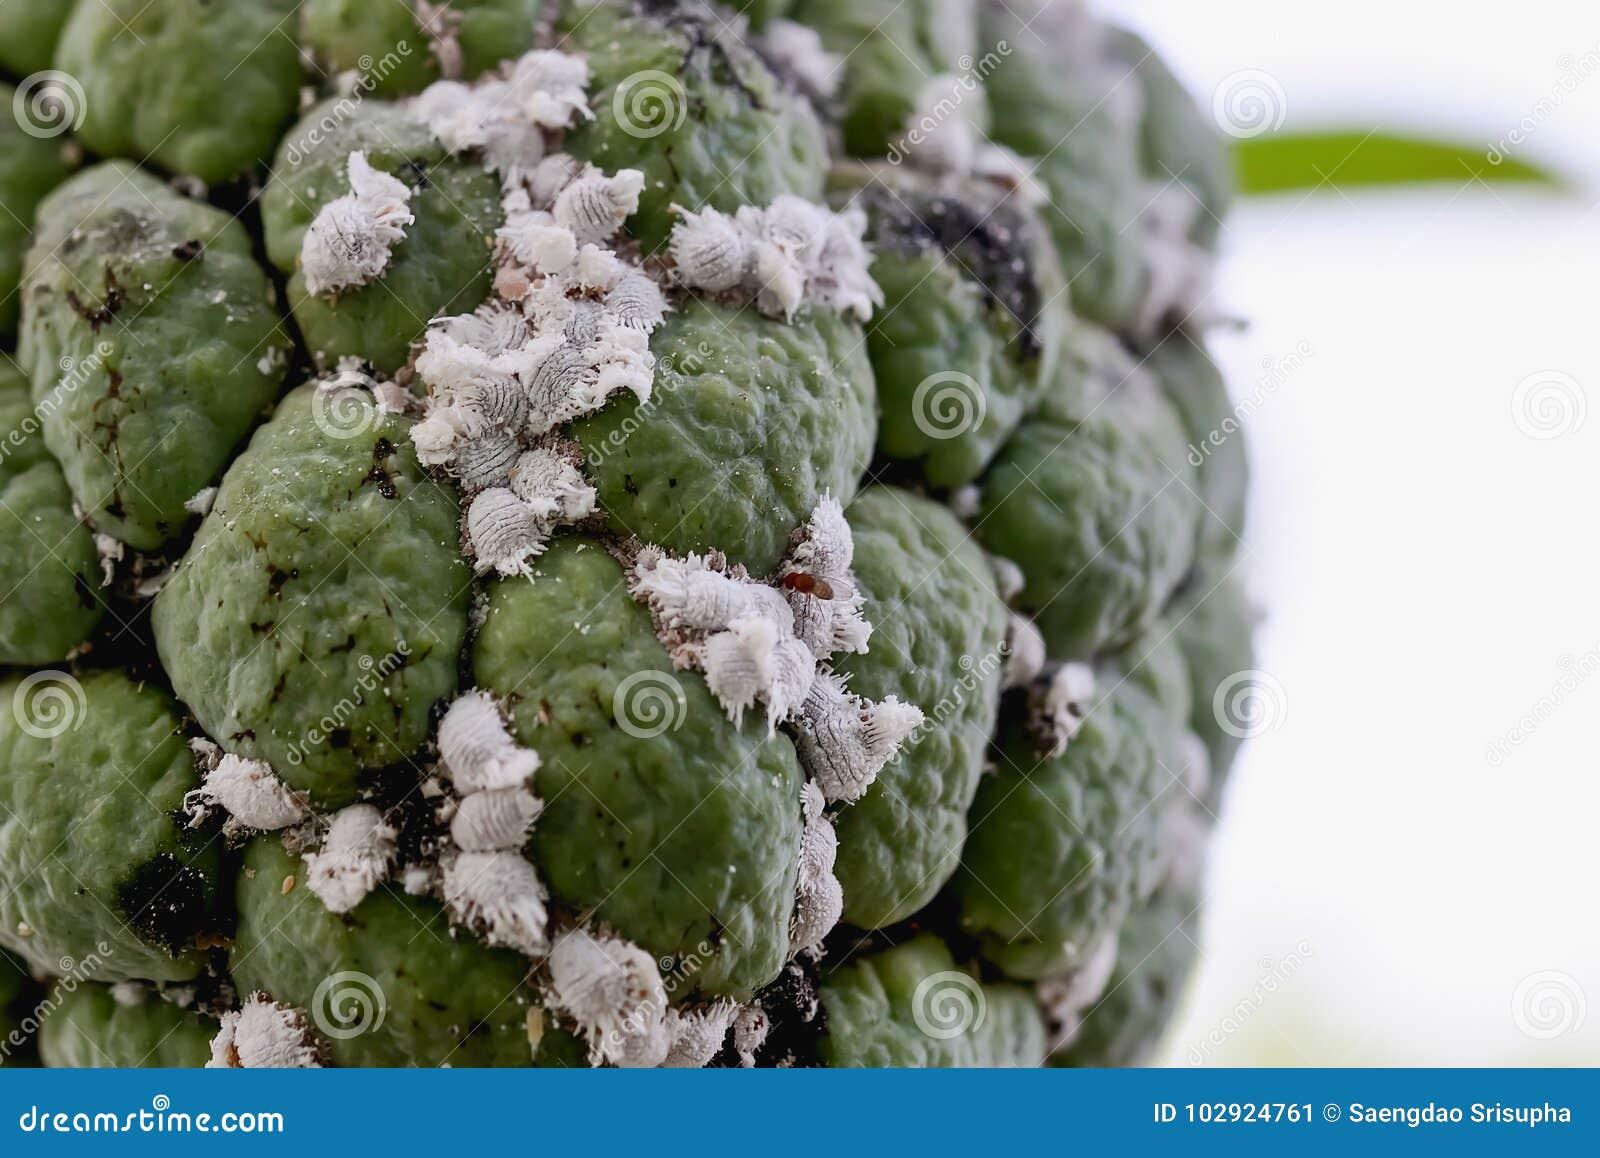 Flour moths stock image. Image of mealybugs, aphids ... - photo#8